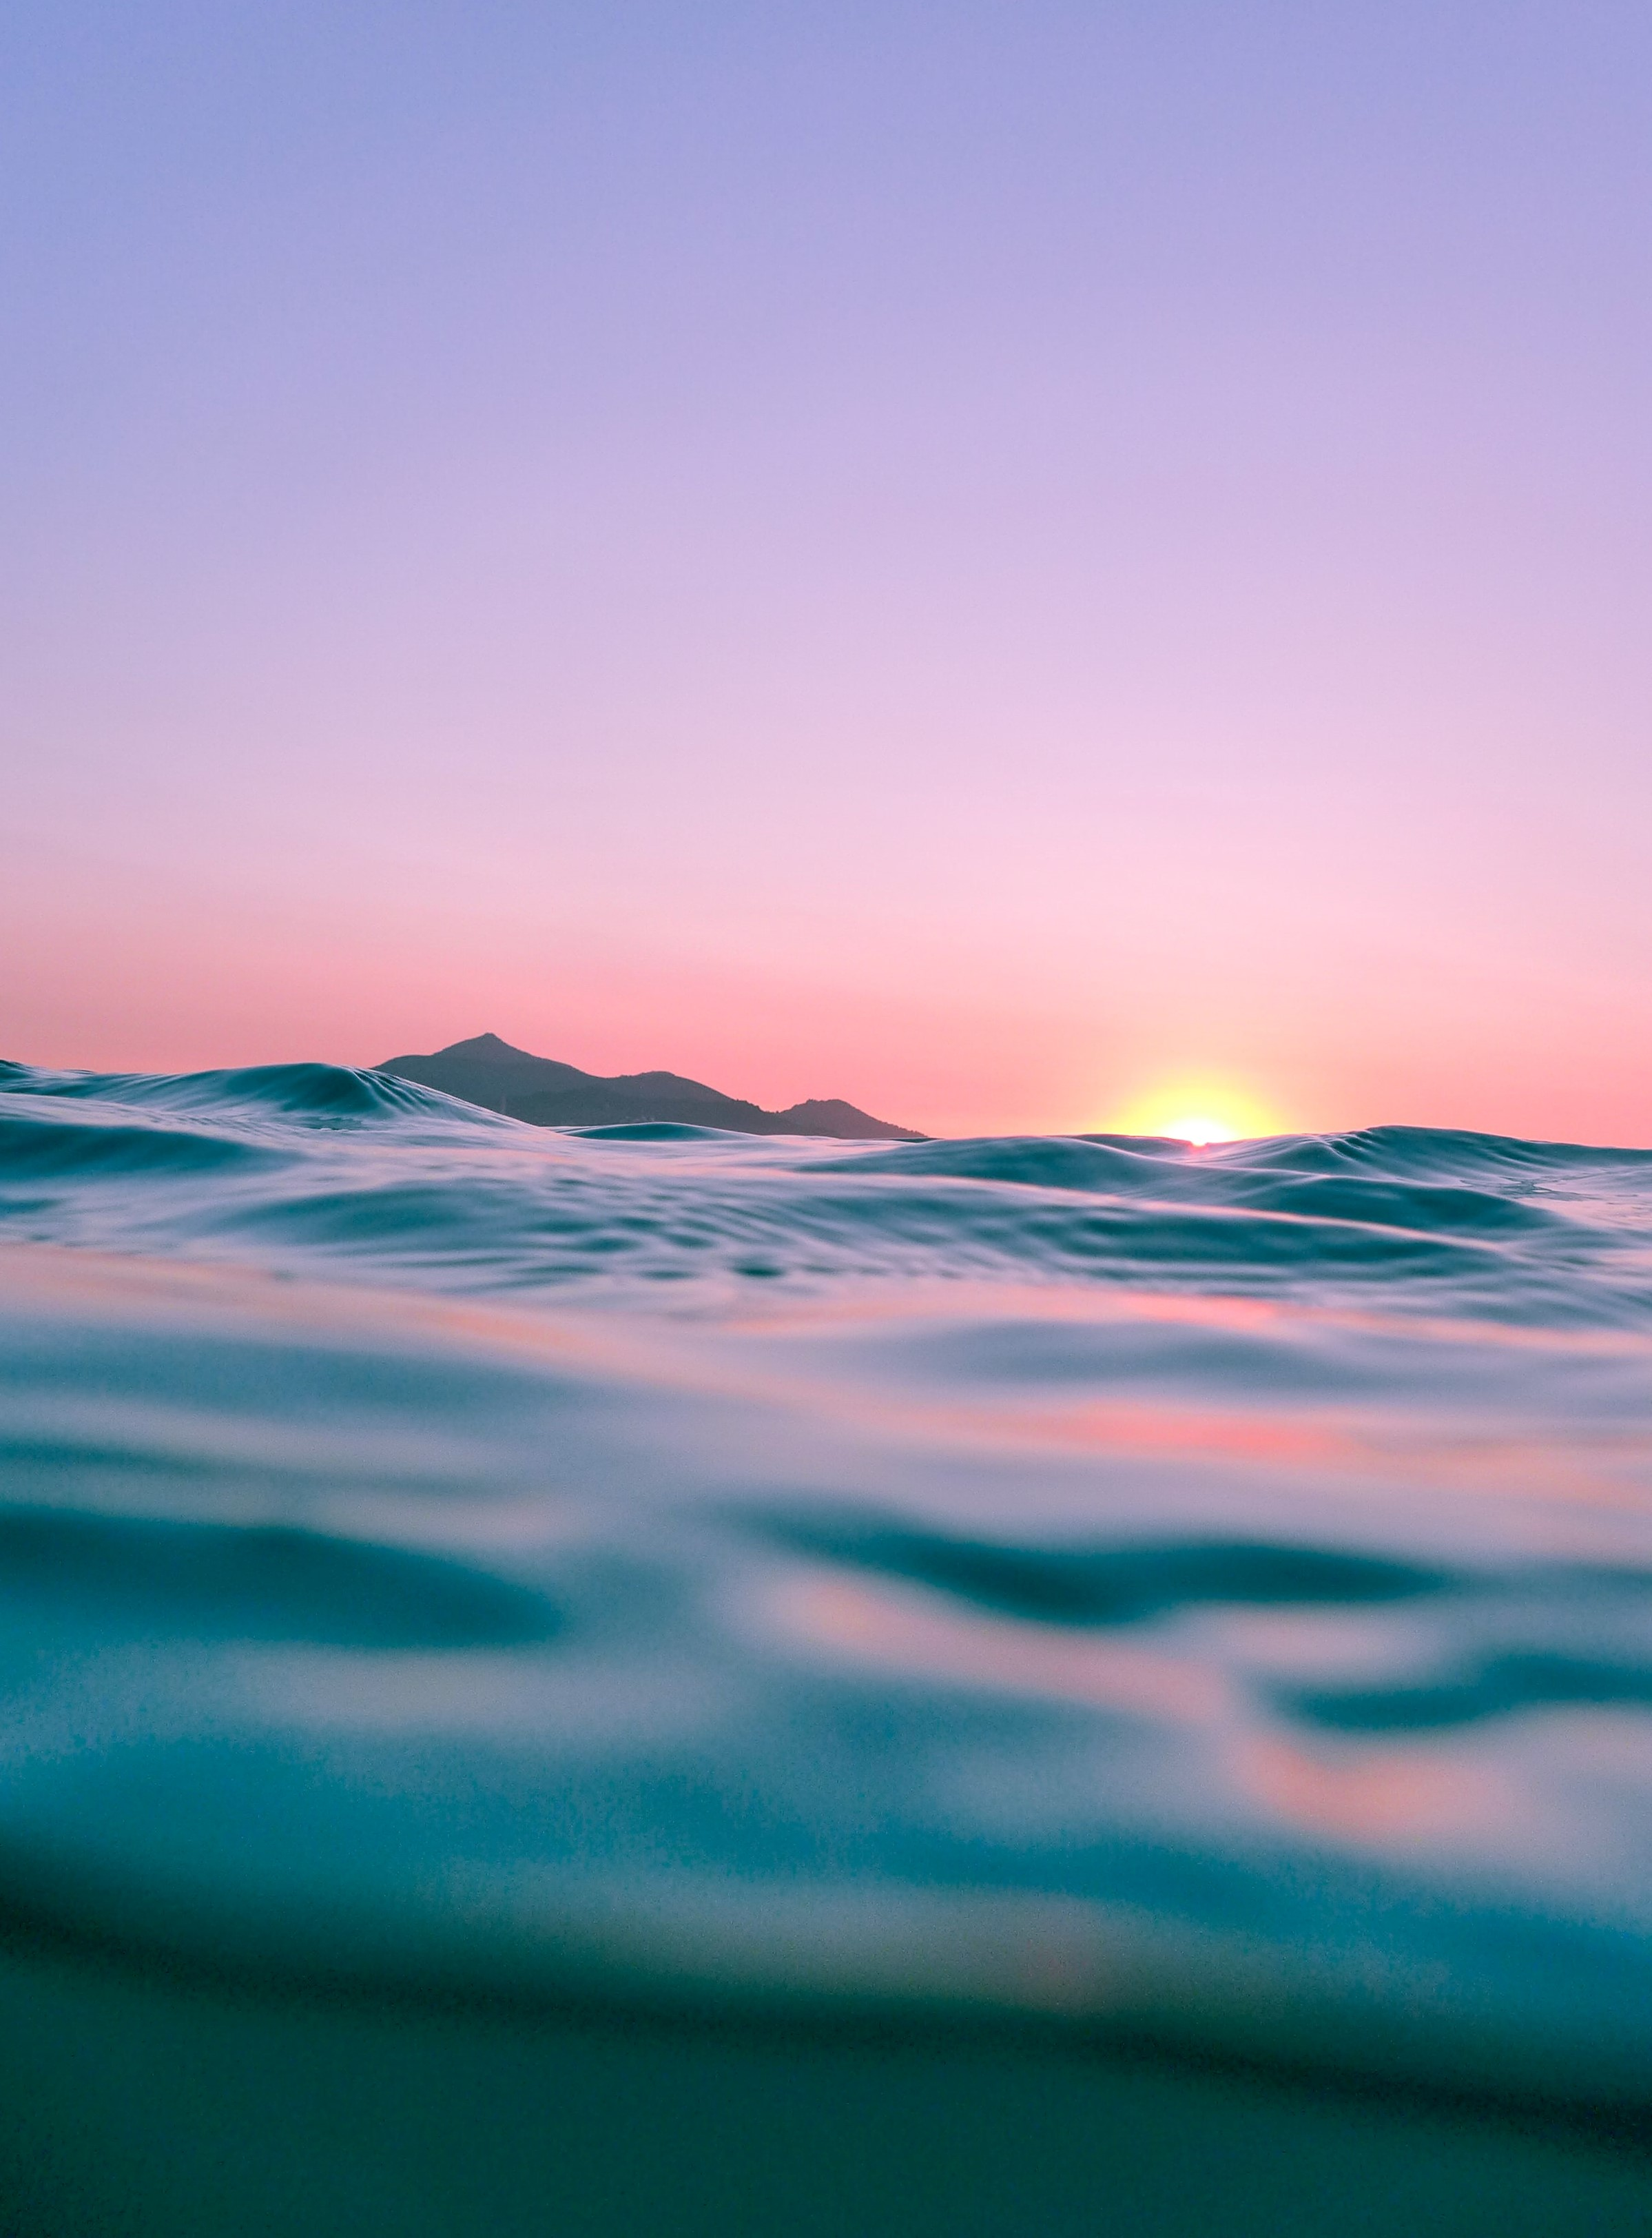 water-mattras